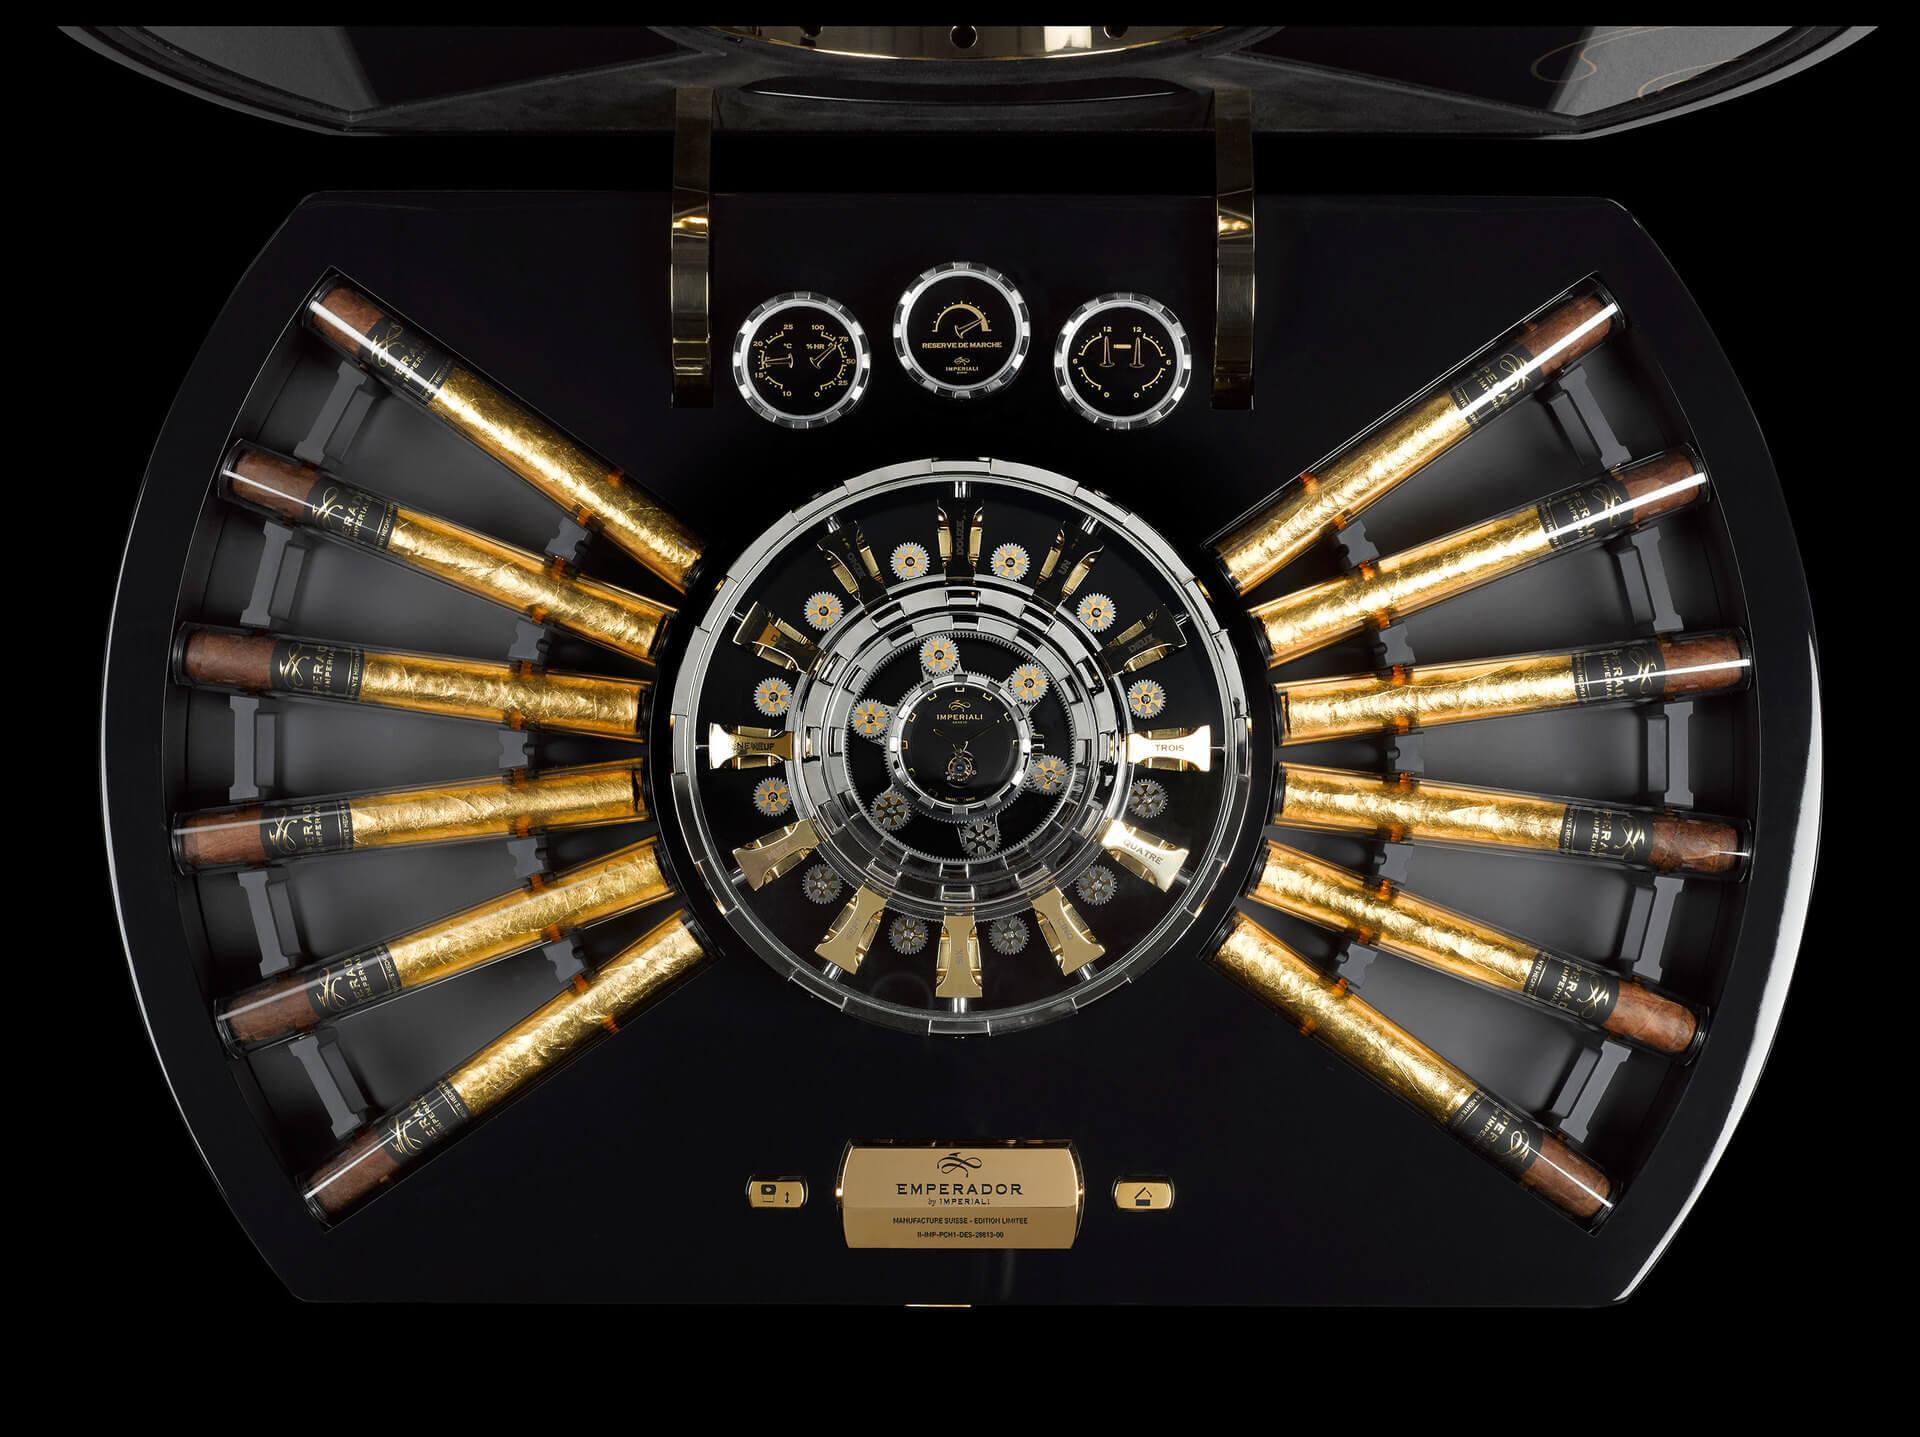 imperiali-geneve-emperador-cigares-cave-coupe-laser-tourbillon-luxe-design-horlogerie-effronté-07